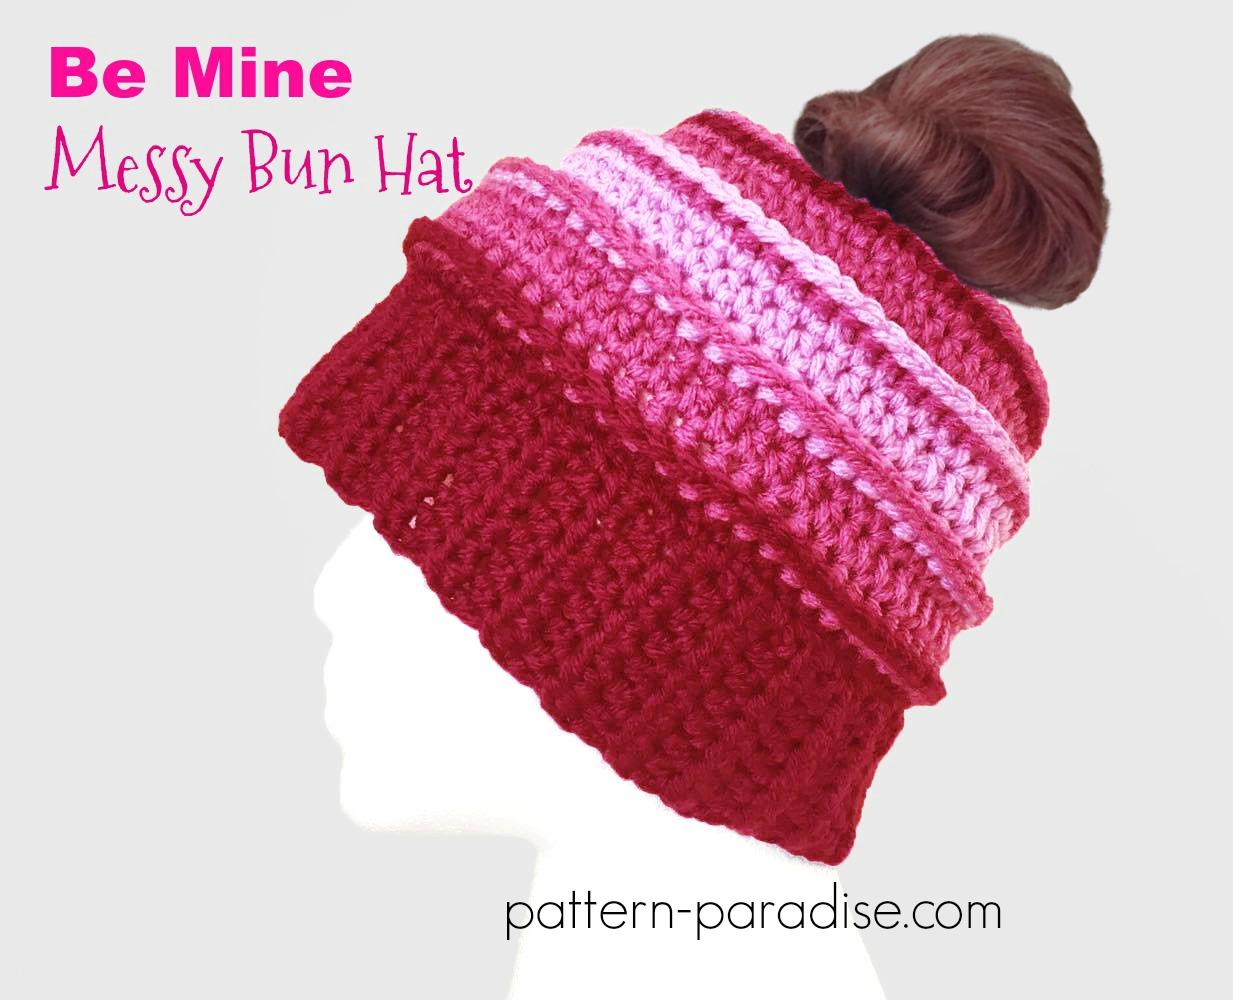 Free Crochet Pattern Be Mine Messy Bun Hat Pattern Paradise